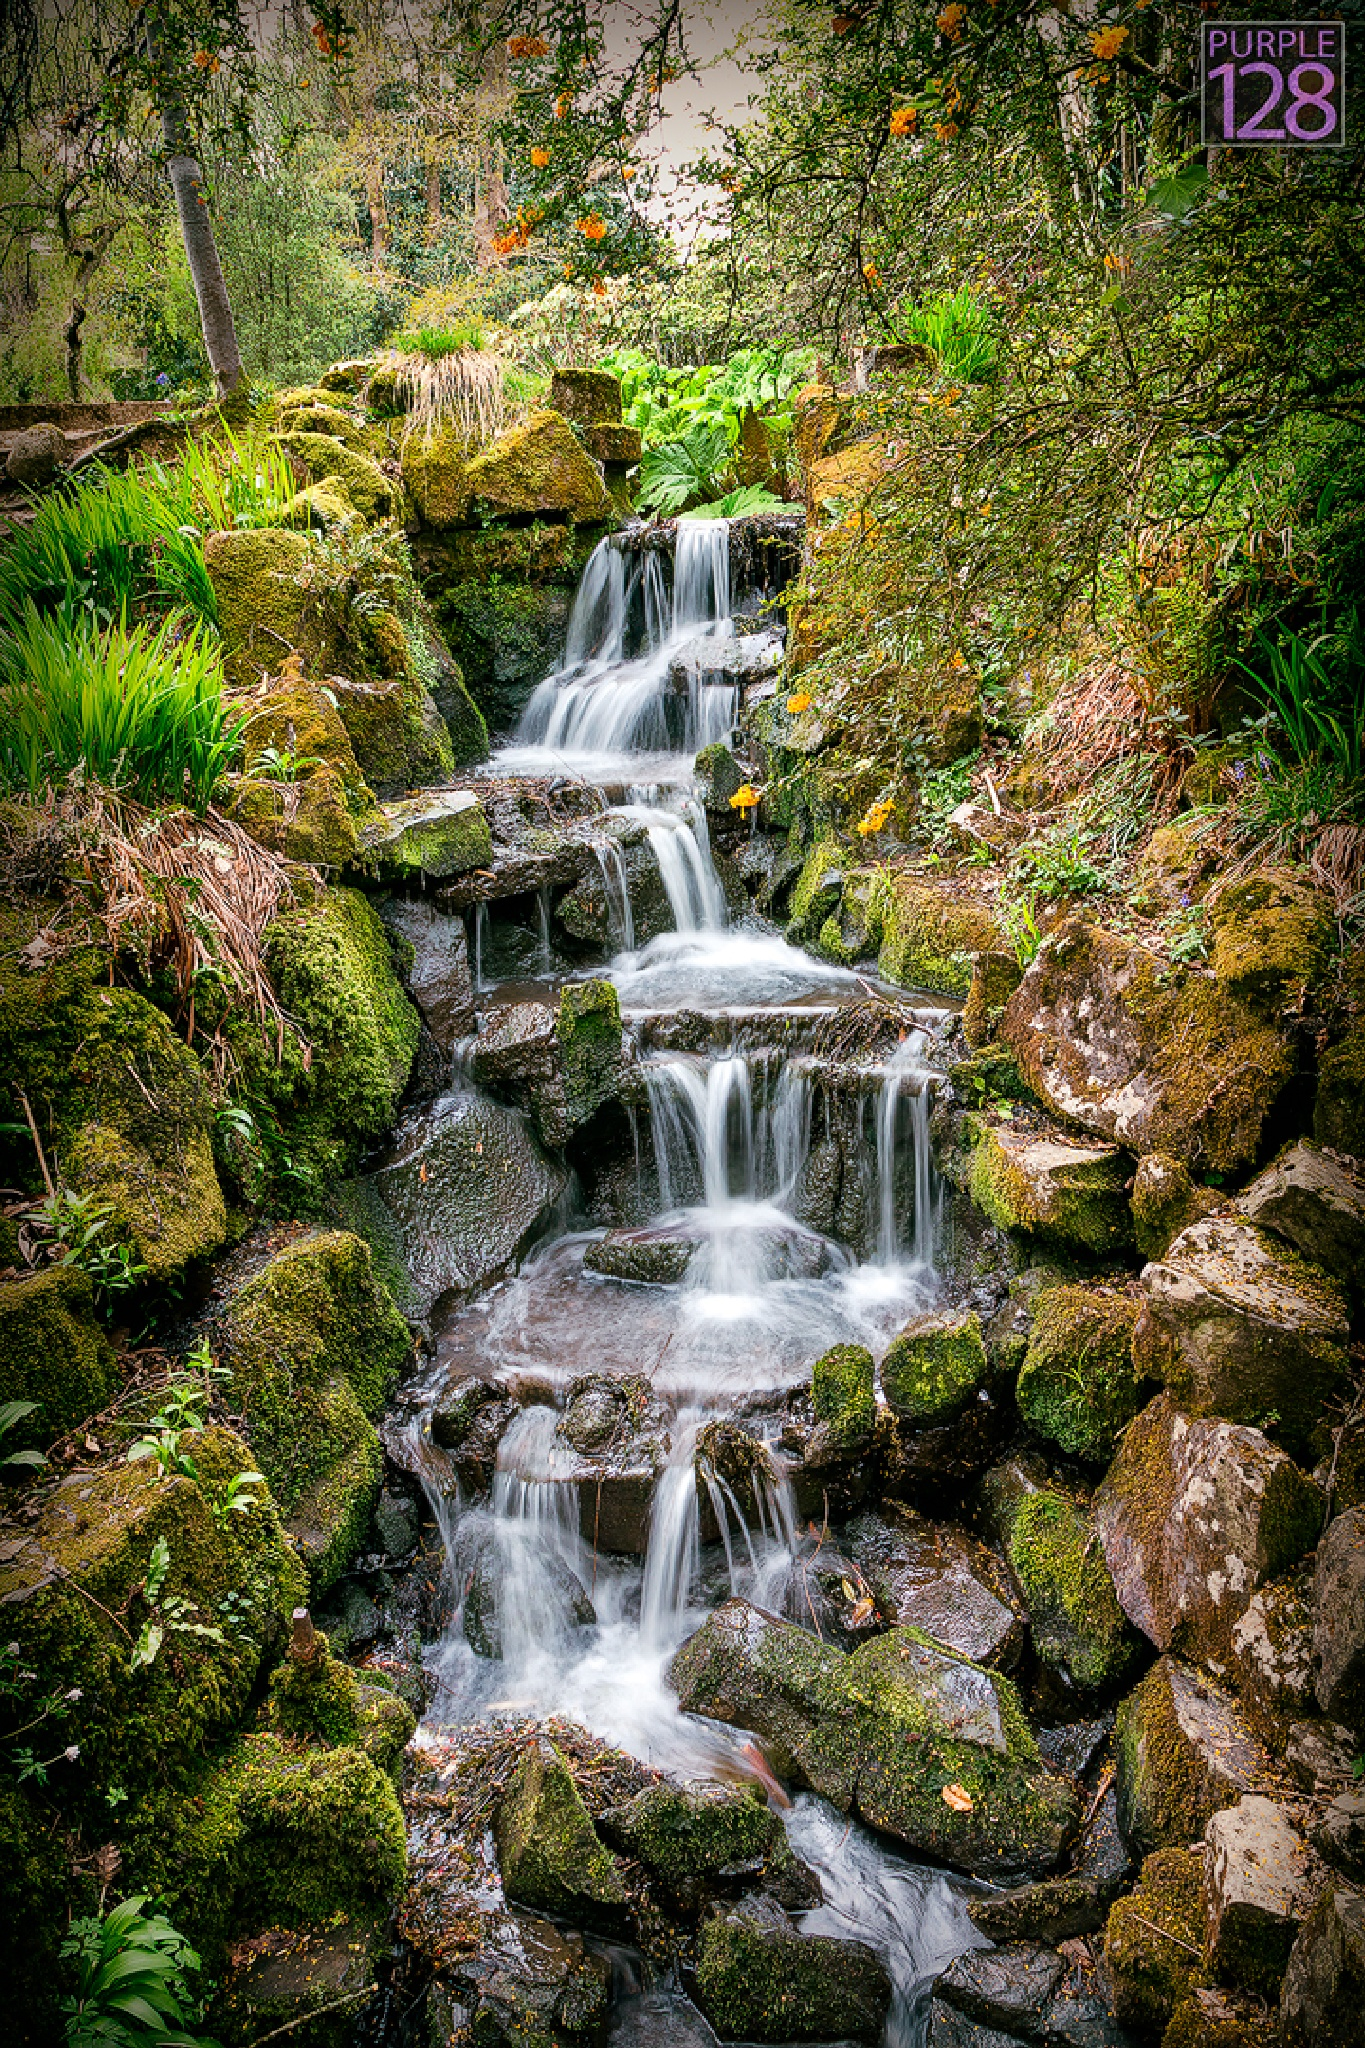 Clyne Gardens, Swansea, South Wales by Purple128